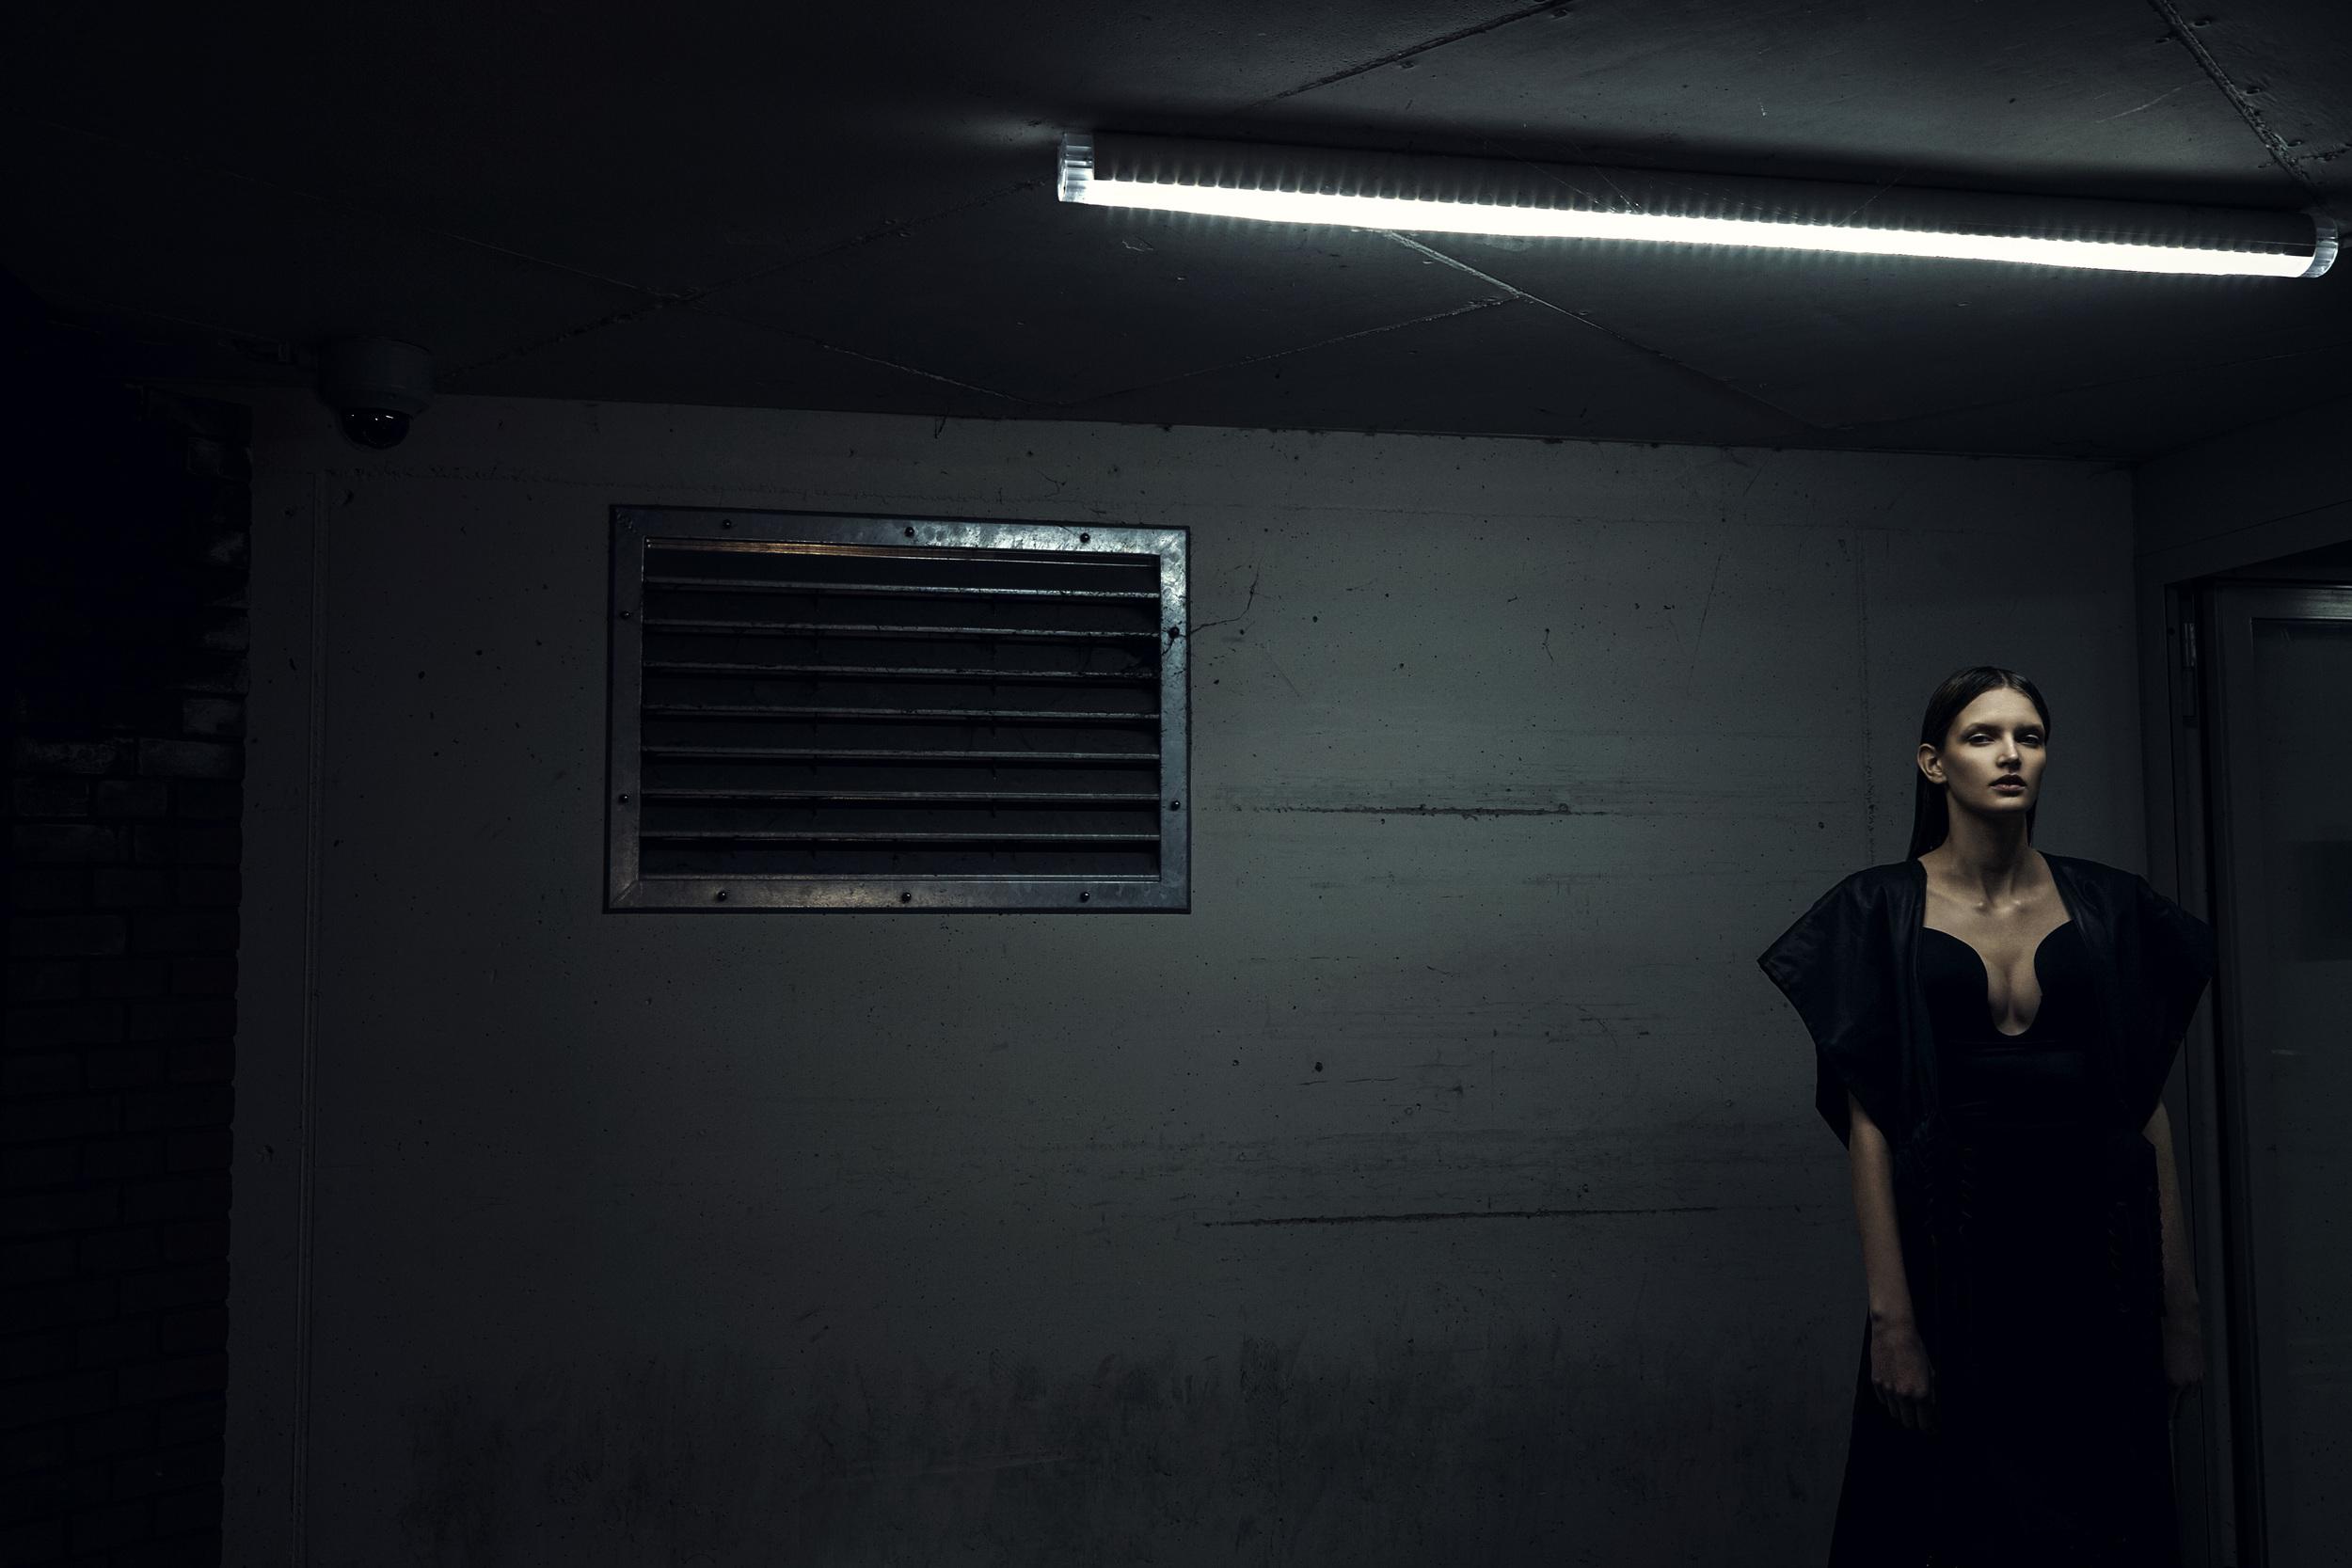 FALL MAGAZINE | IMRPISONMENT | PHOTOGRAPHY Romy Treebusch @ Cakefilm | MUAH Alexandra Leijs | MODEL Anouk @ Elite Model Management